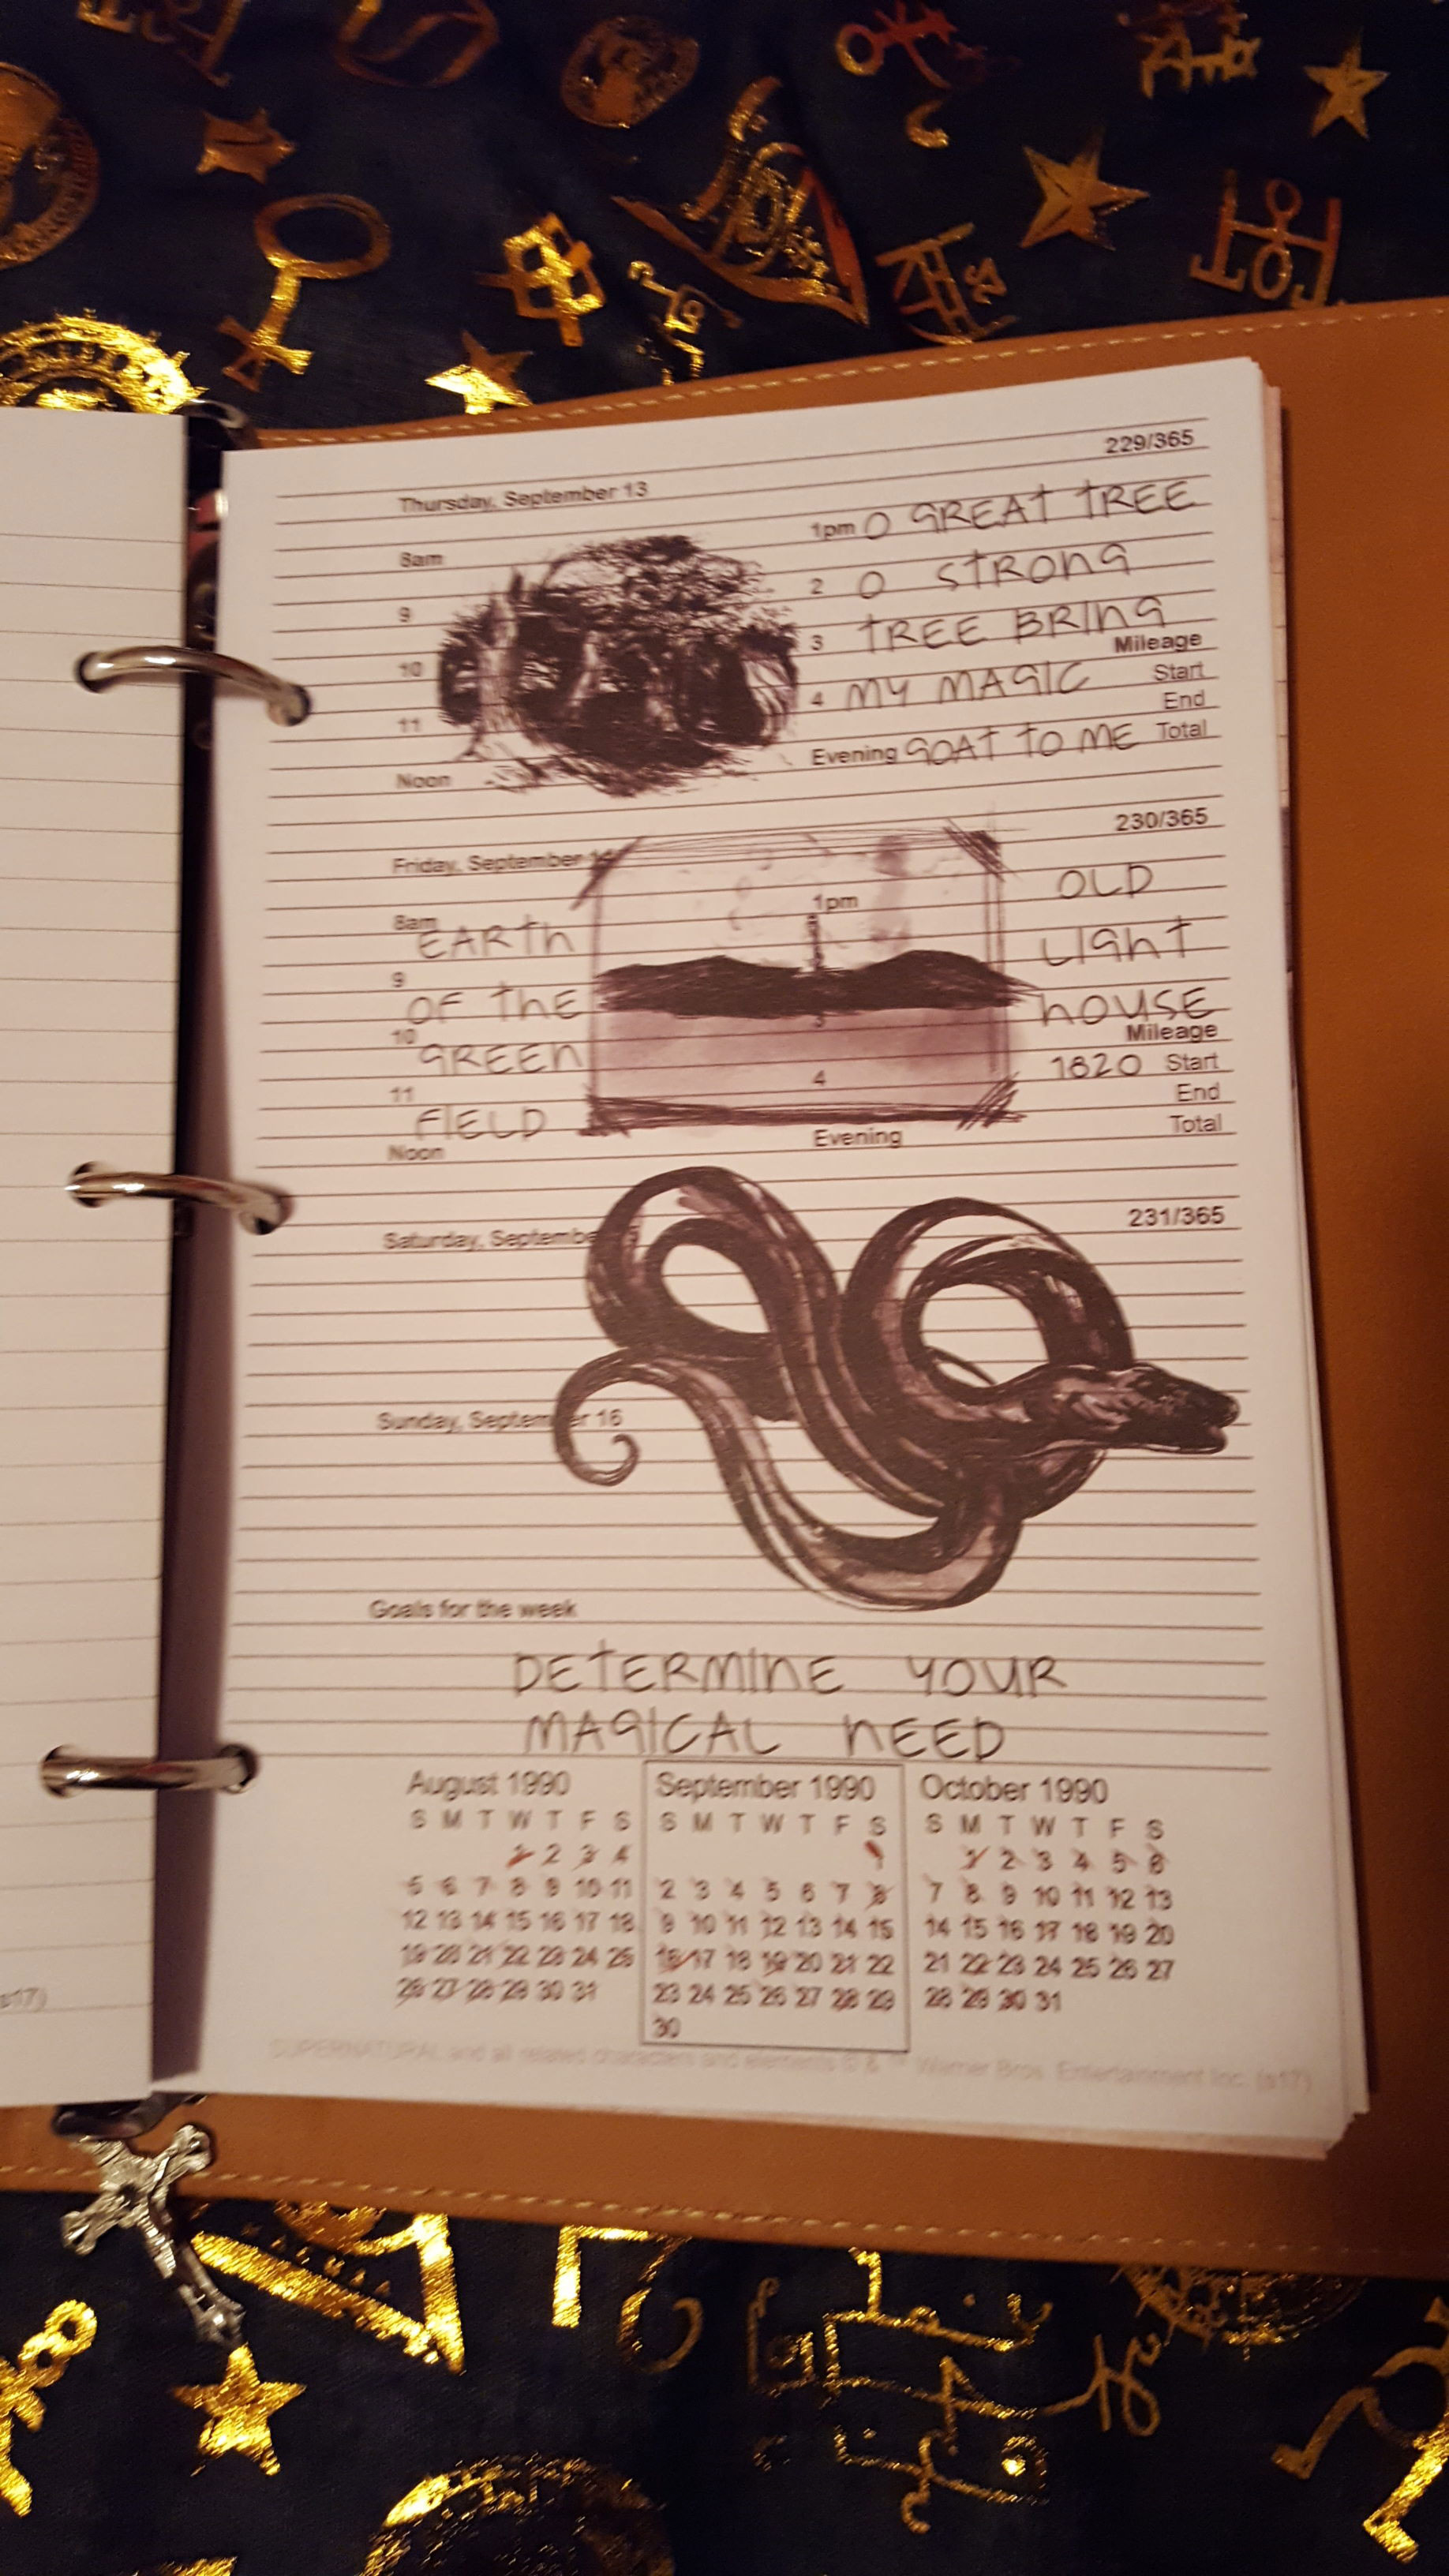 John Winchester's journal entries